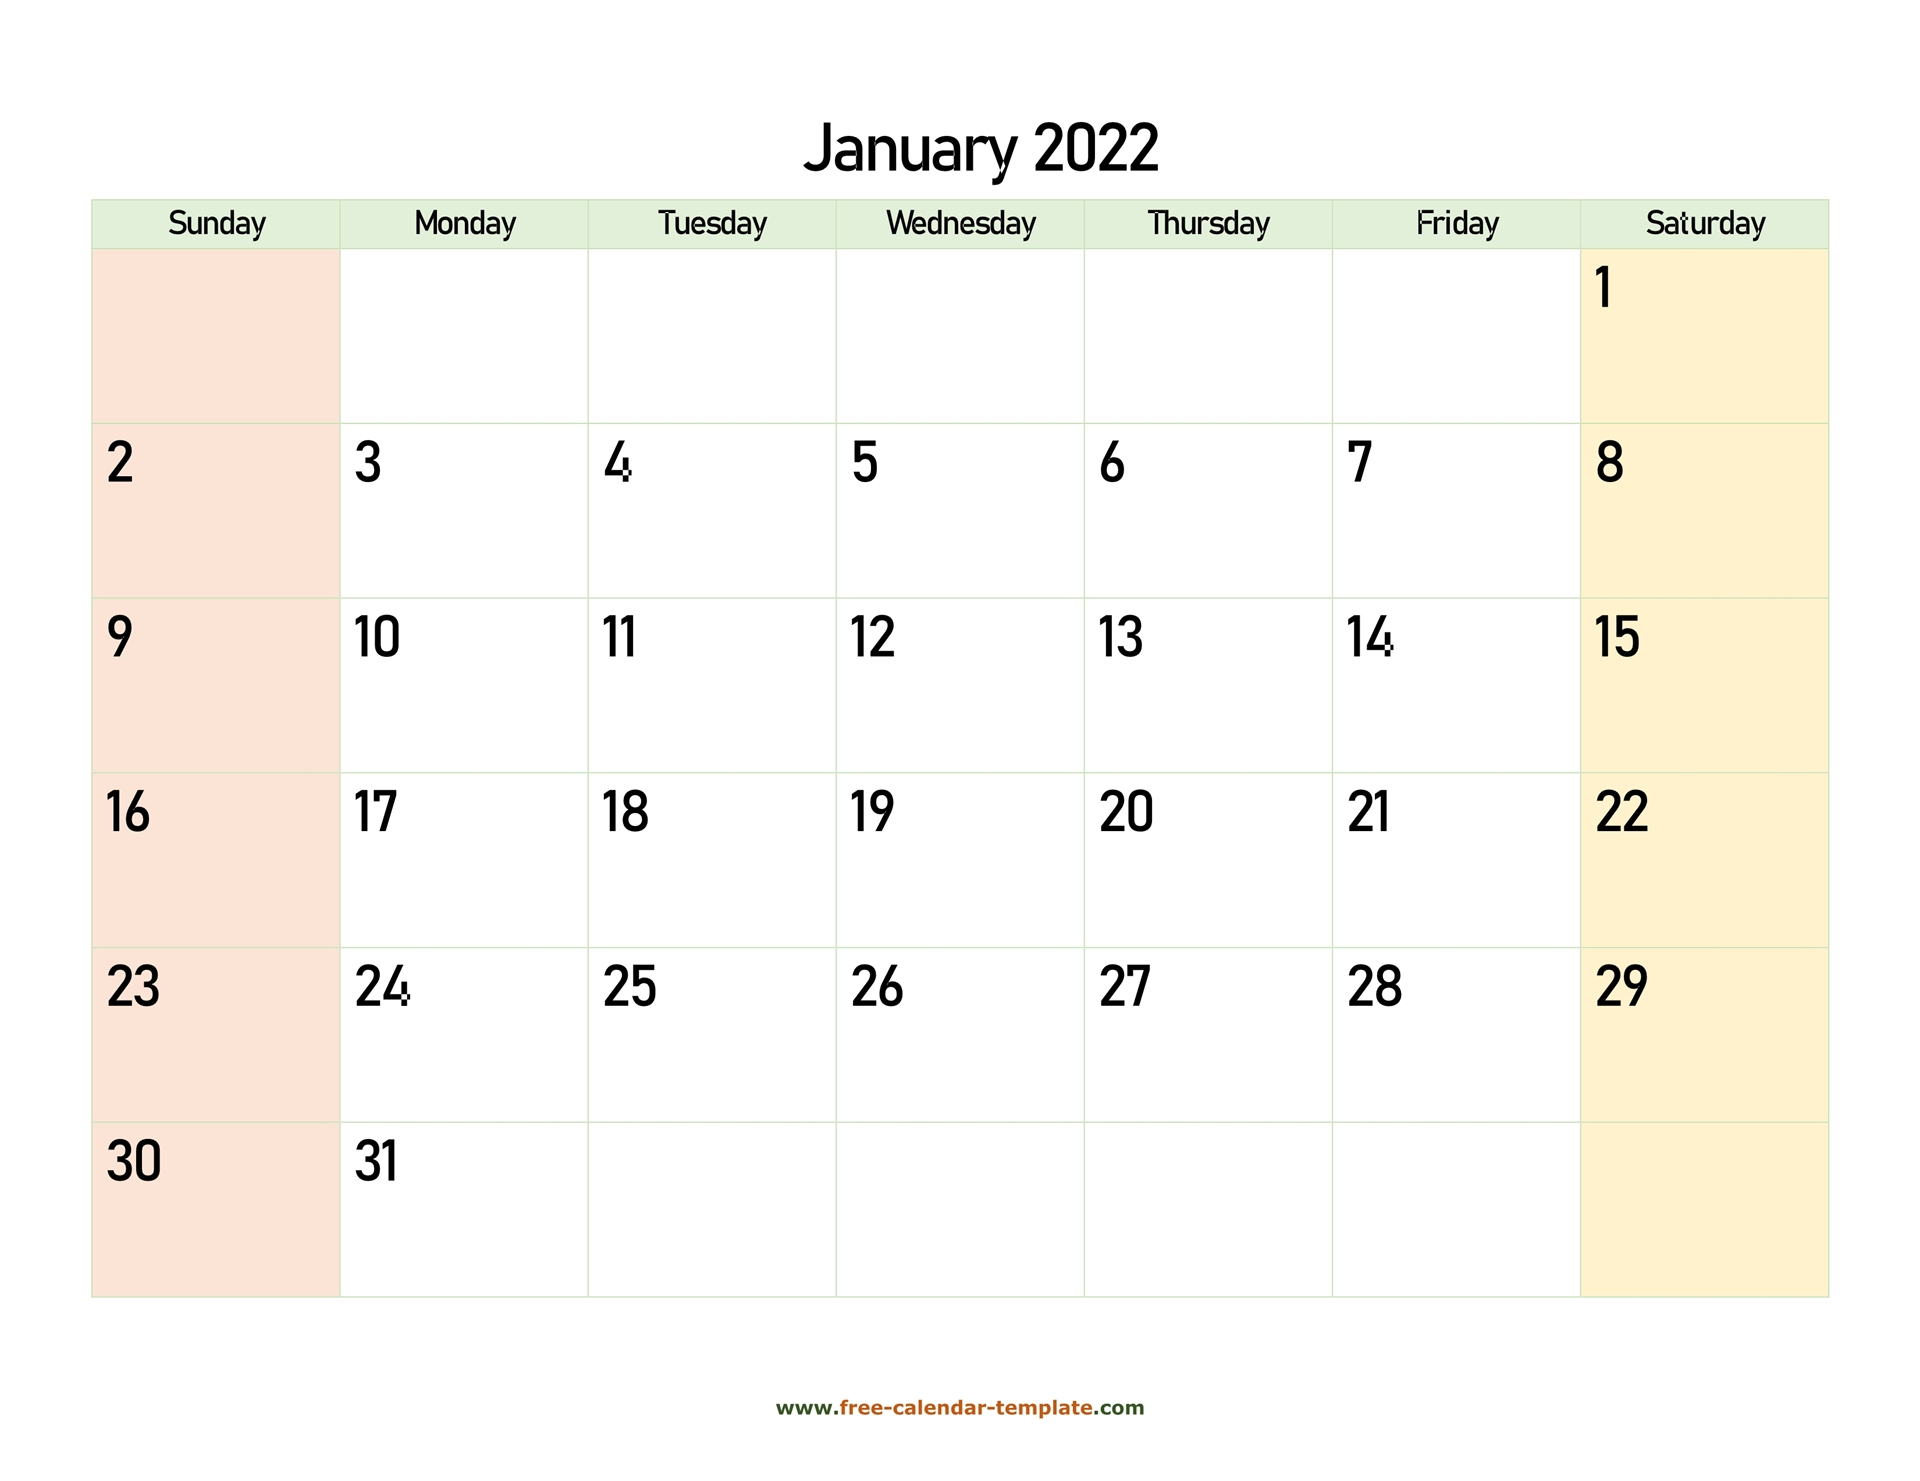 January 2022 Free Calendar Tempplate   Free Calendar Inside Monthly Calendar 2022 January